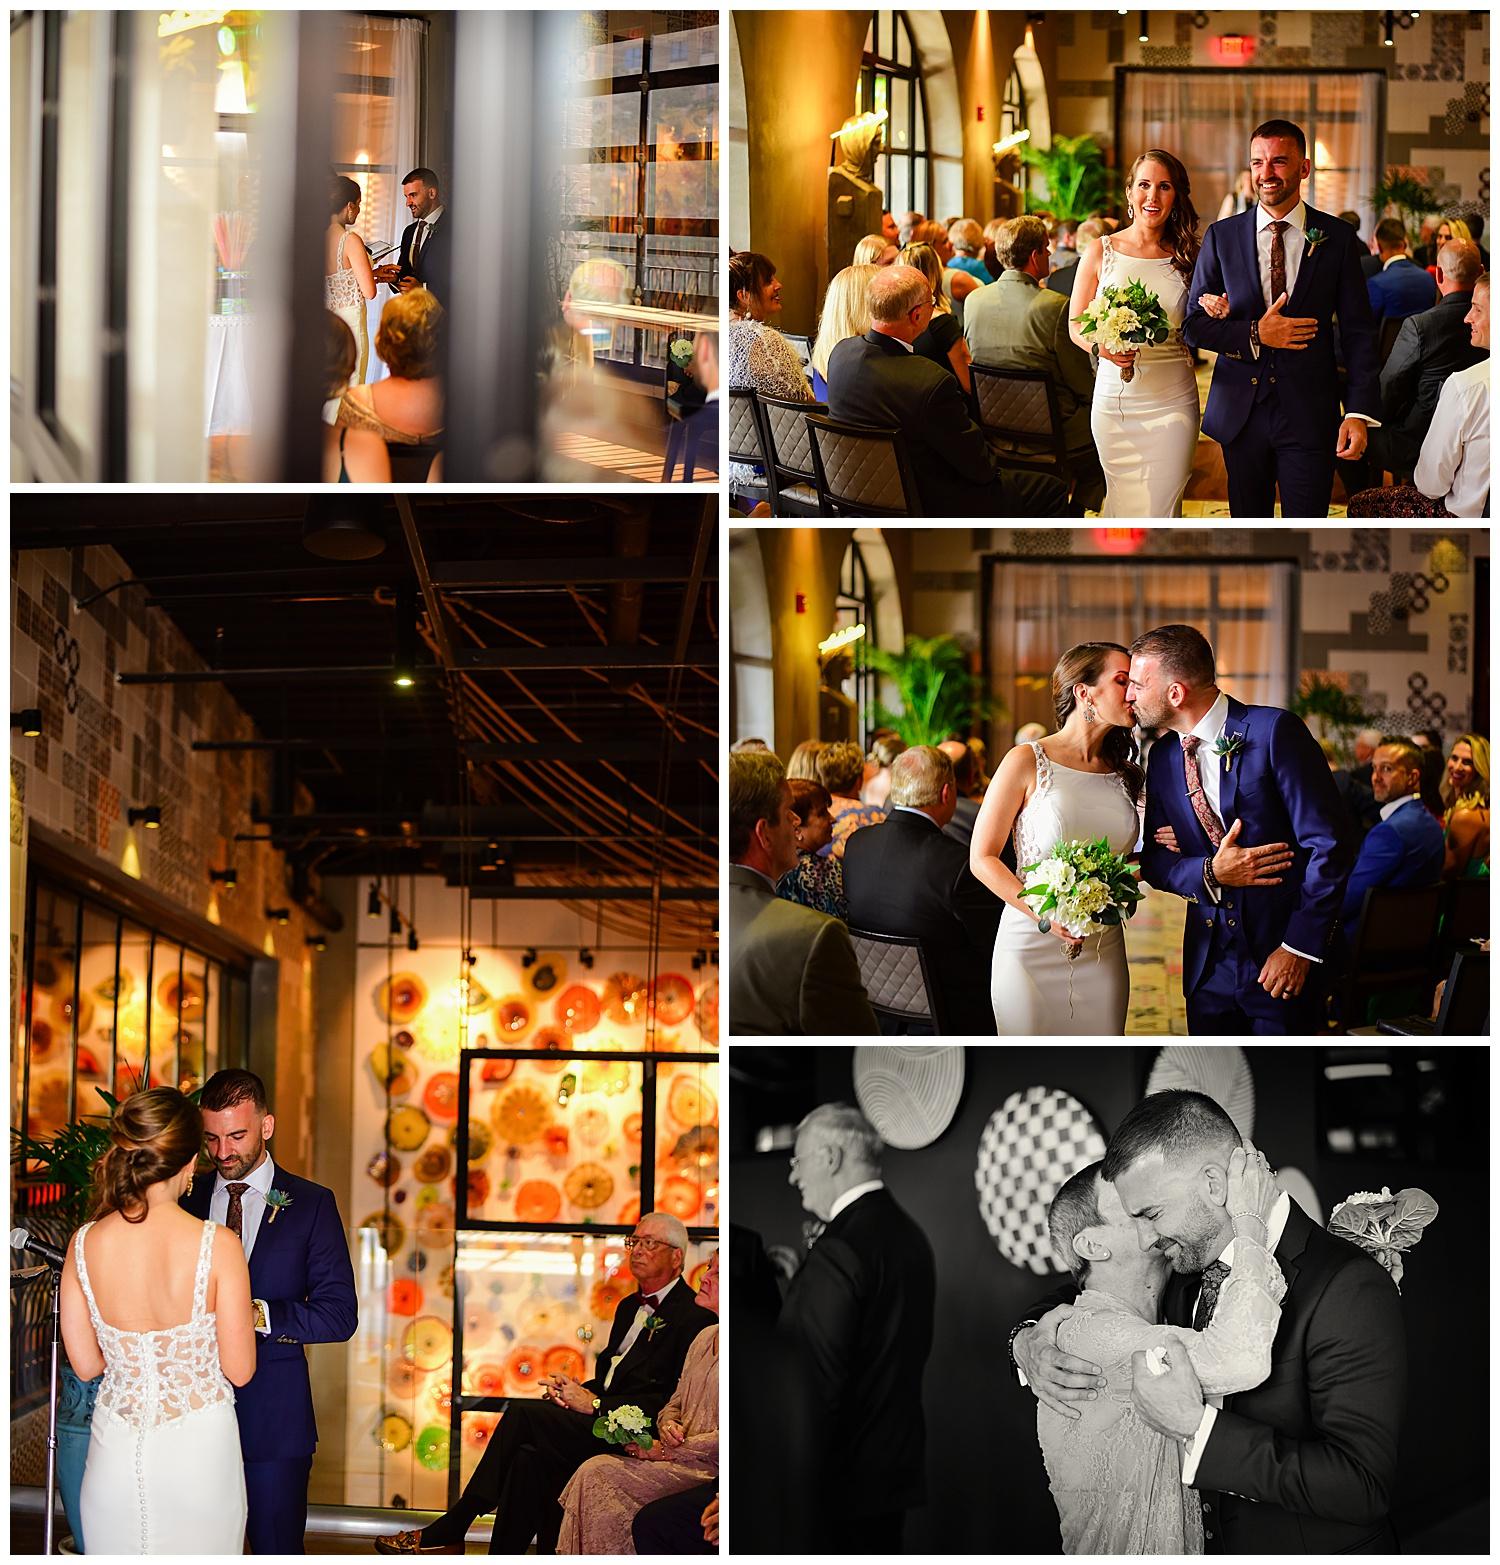 Vidrio Raleigh Wedding Ceremony